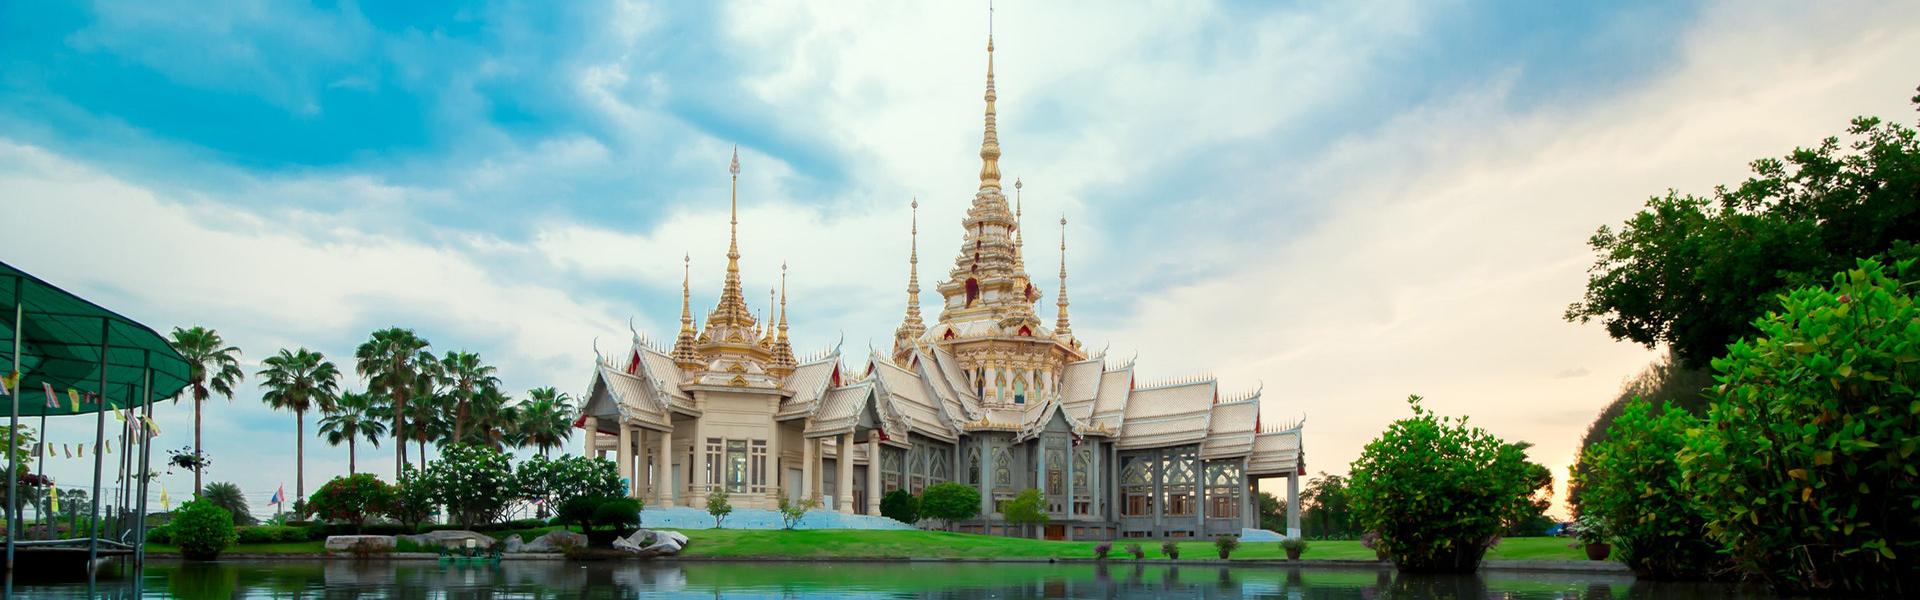 Екскурзия до Пукет, Тайланд